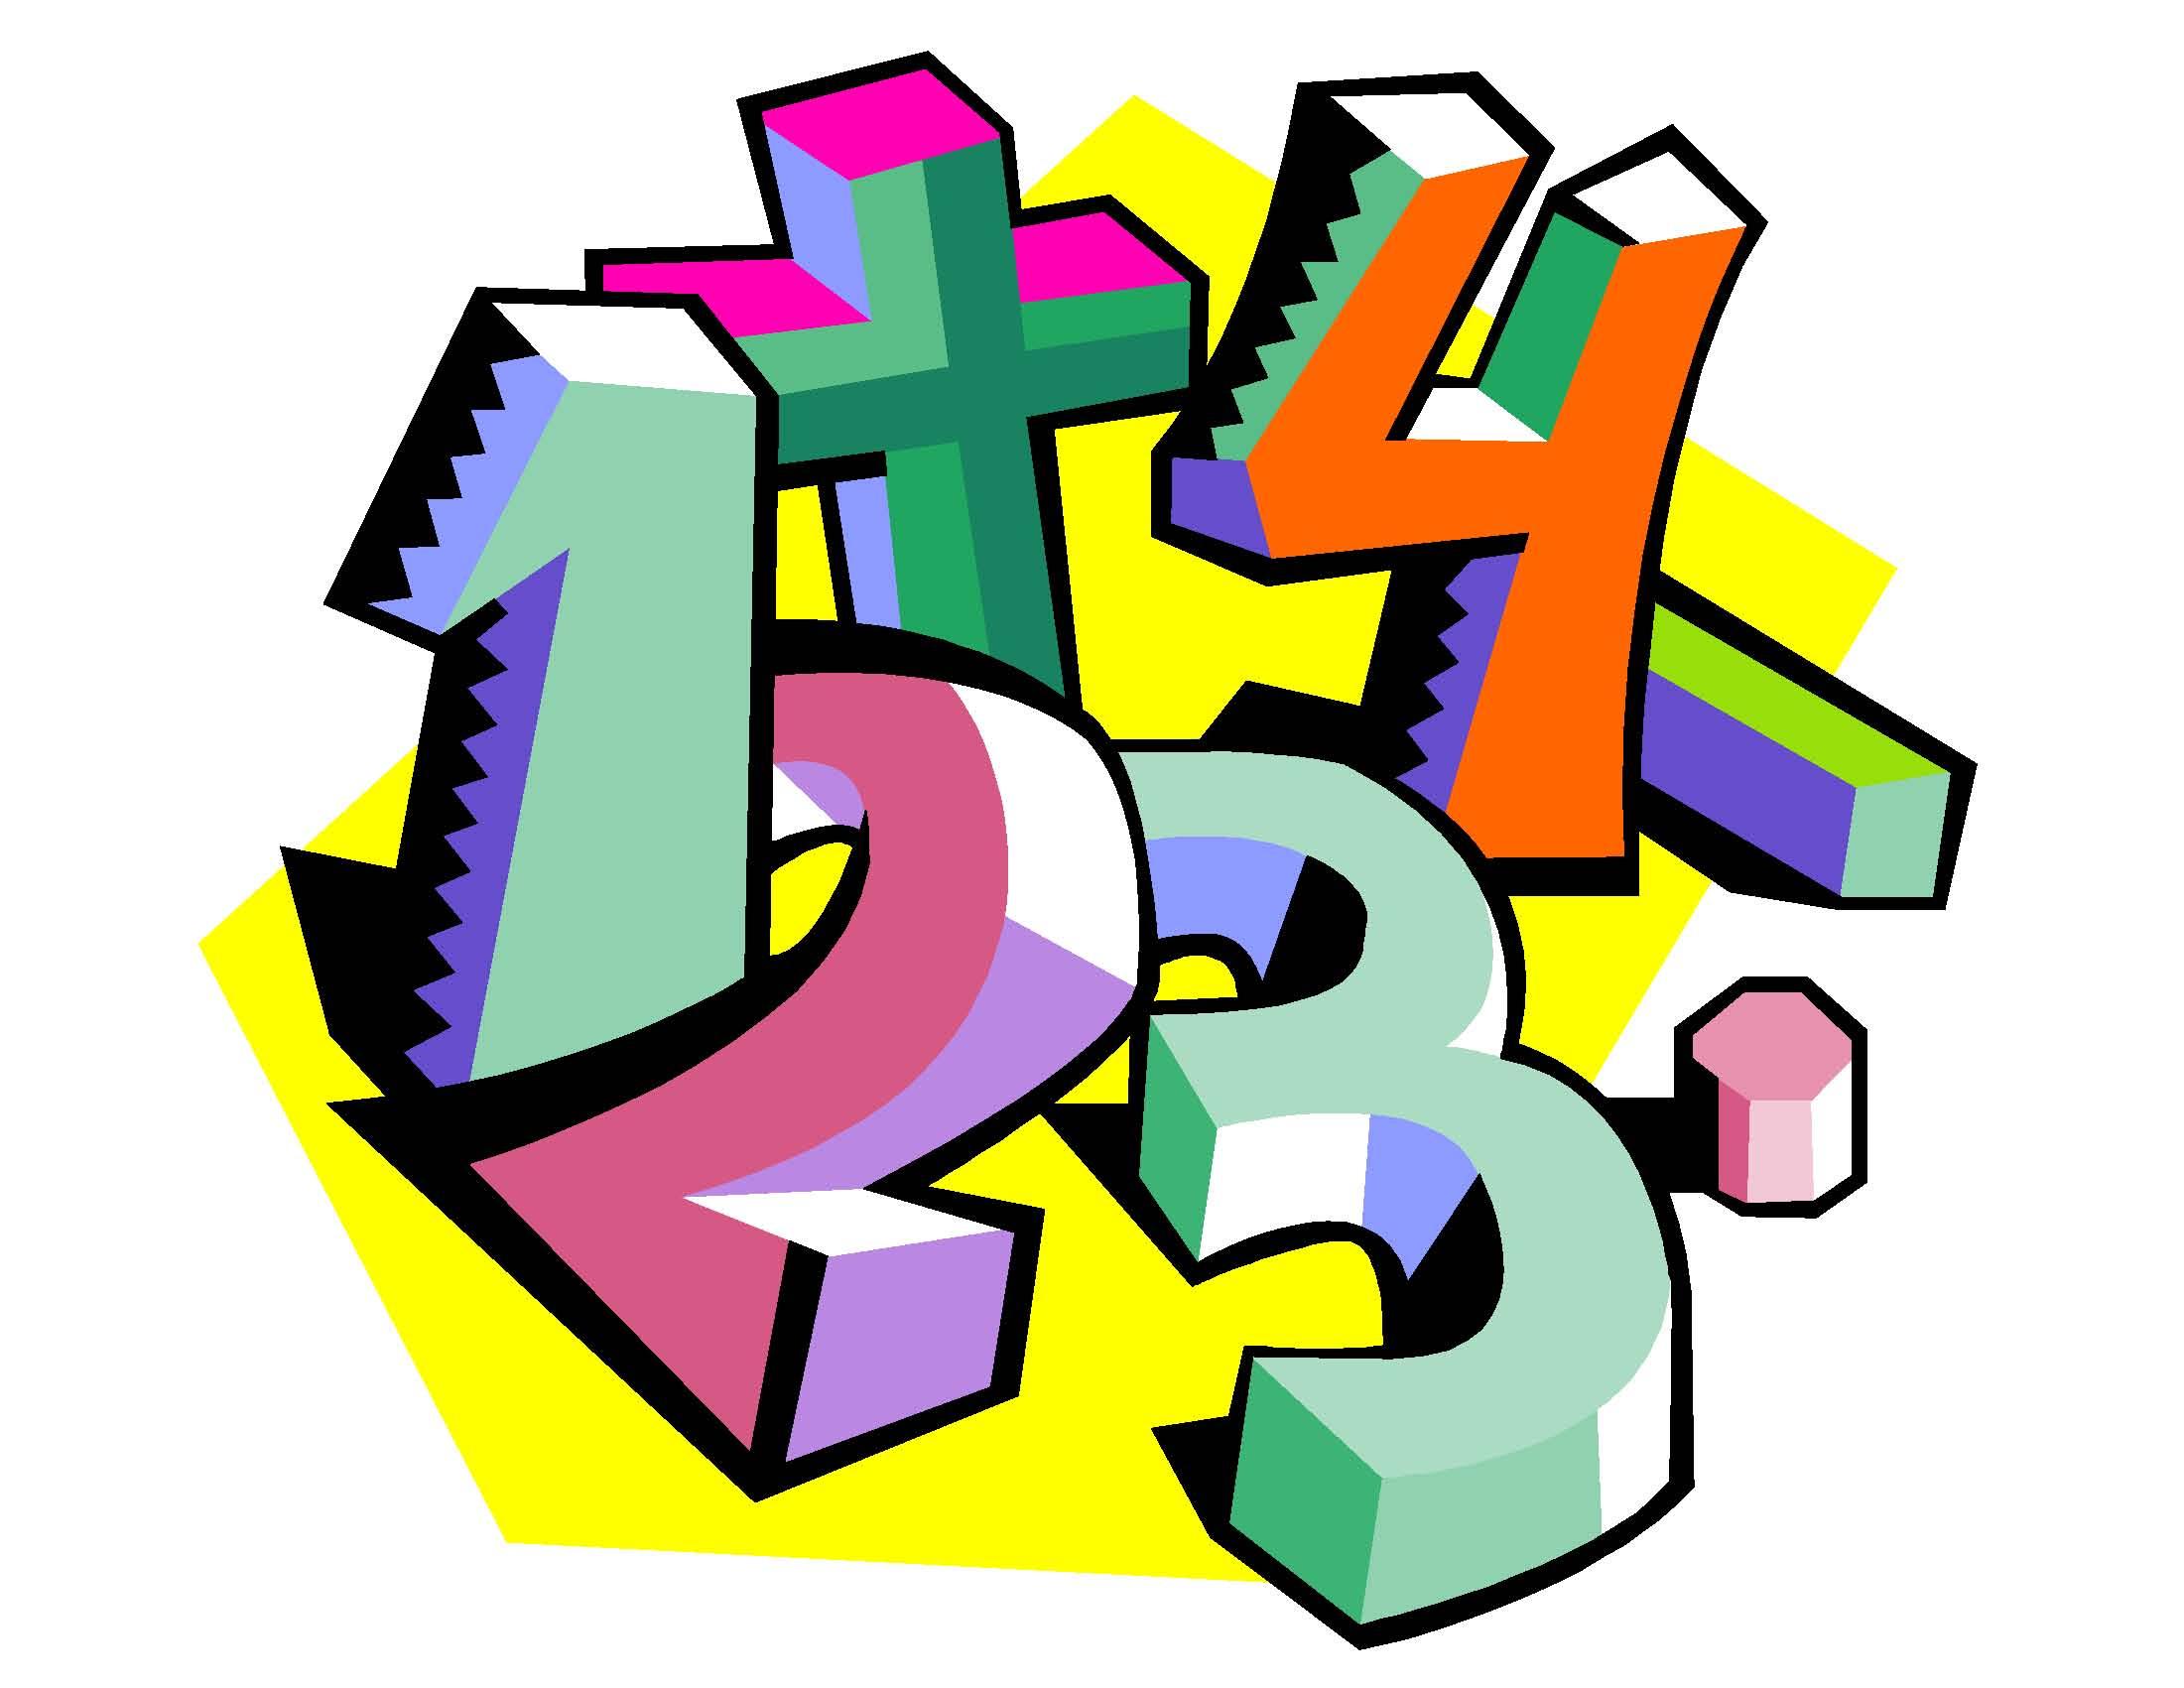 2201x1701 Math And Brain Teasers